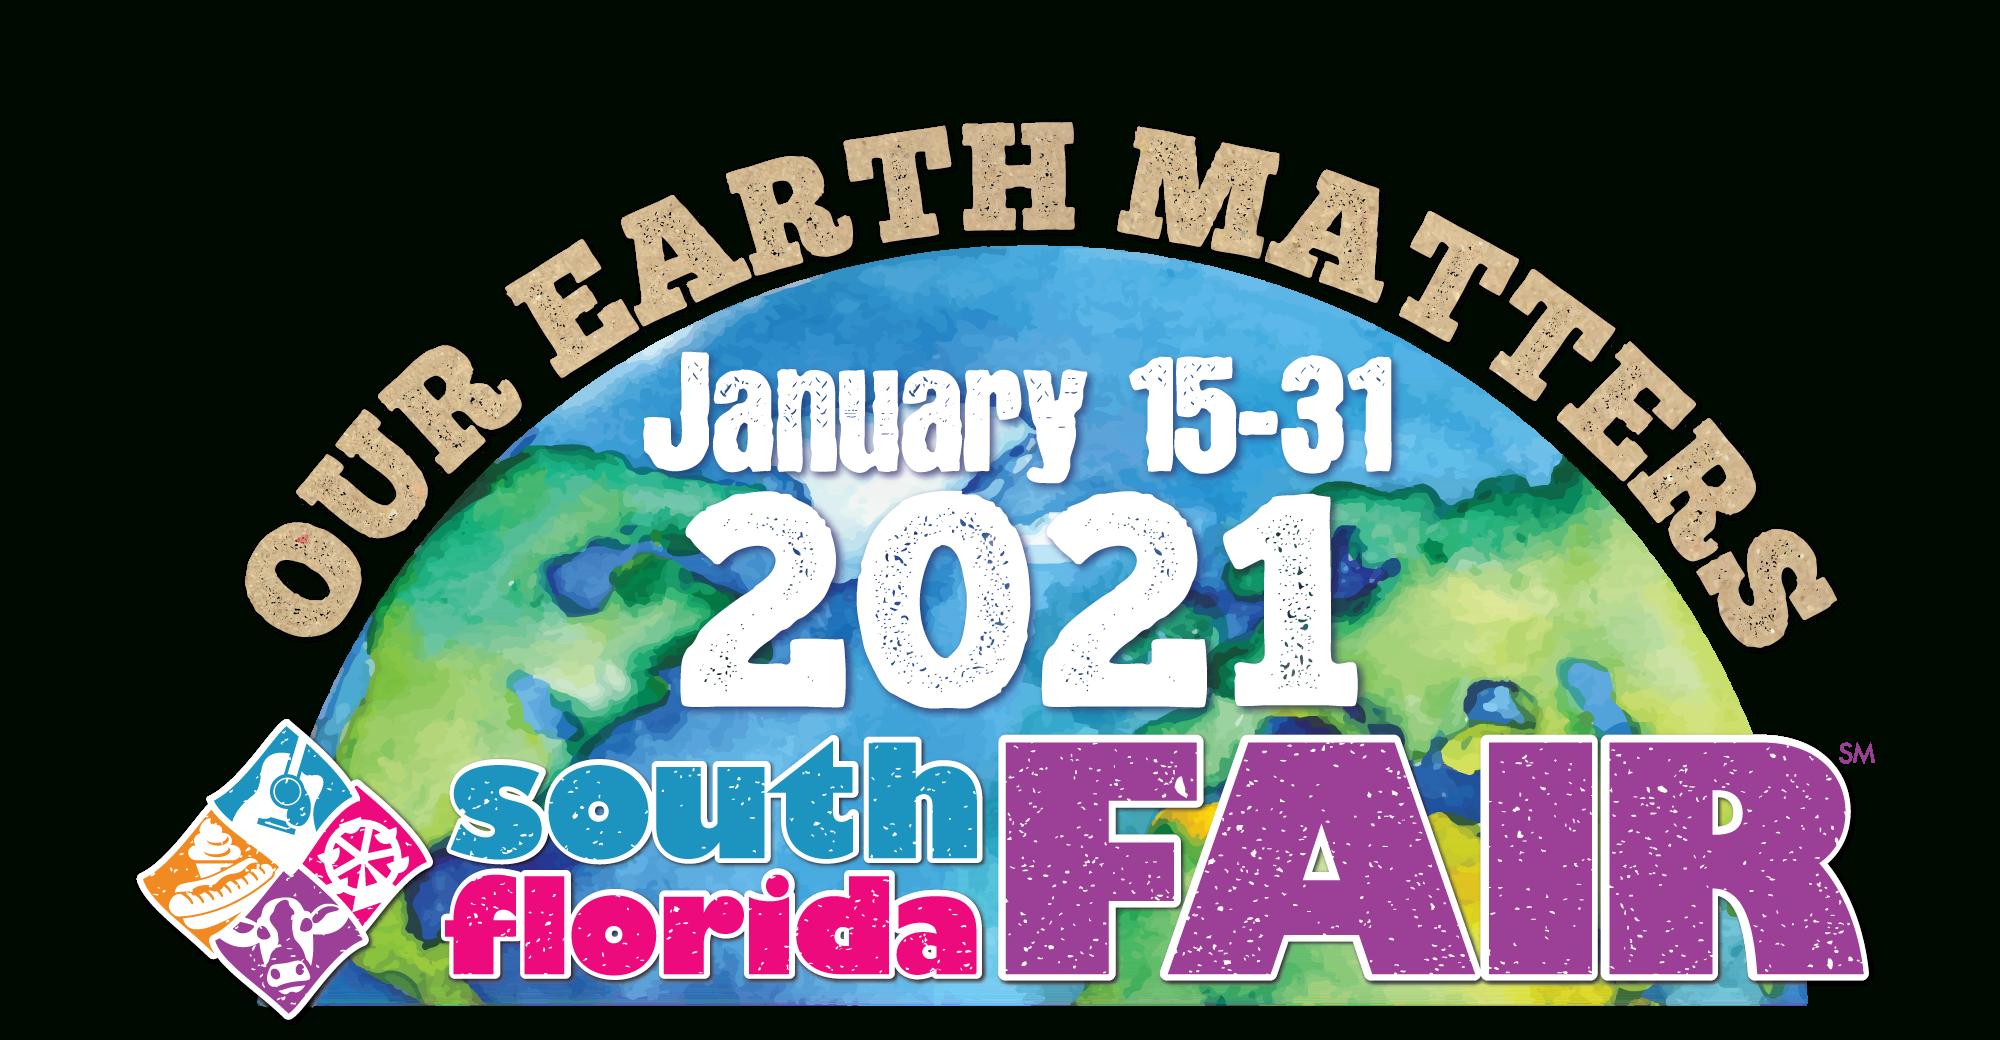 Our Earth Matters At The 2021 South Florida Fair, Jan. 15 31 With Regard To Calendar South Florida Fair